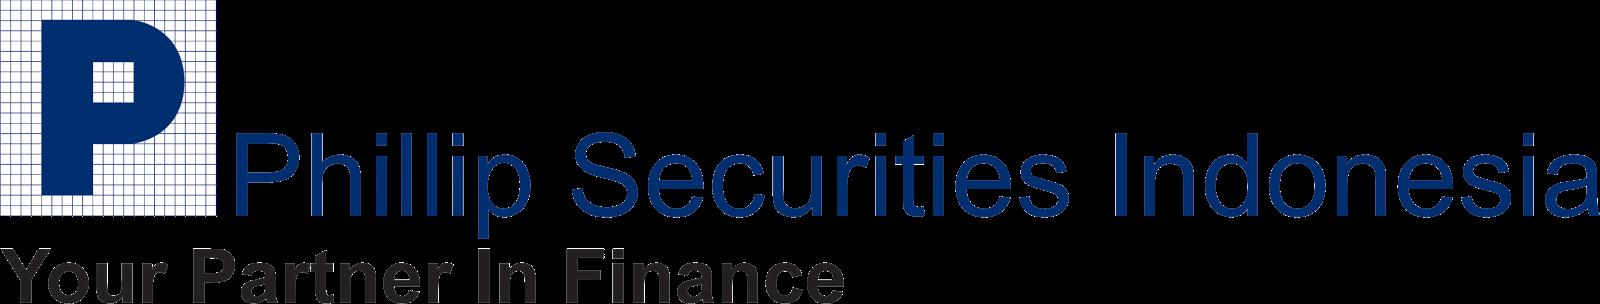 Phillip Securities Singapore Exchange Limited Phillip